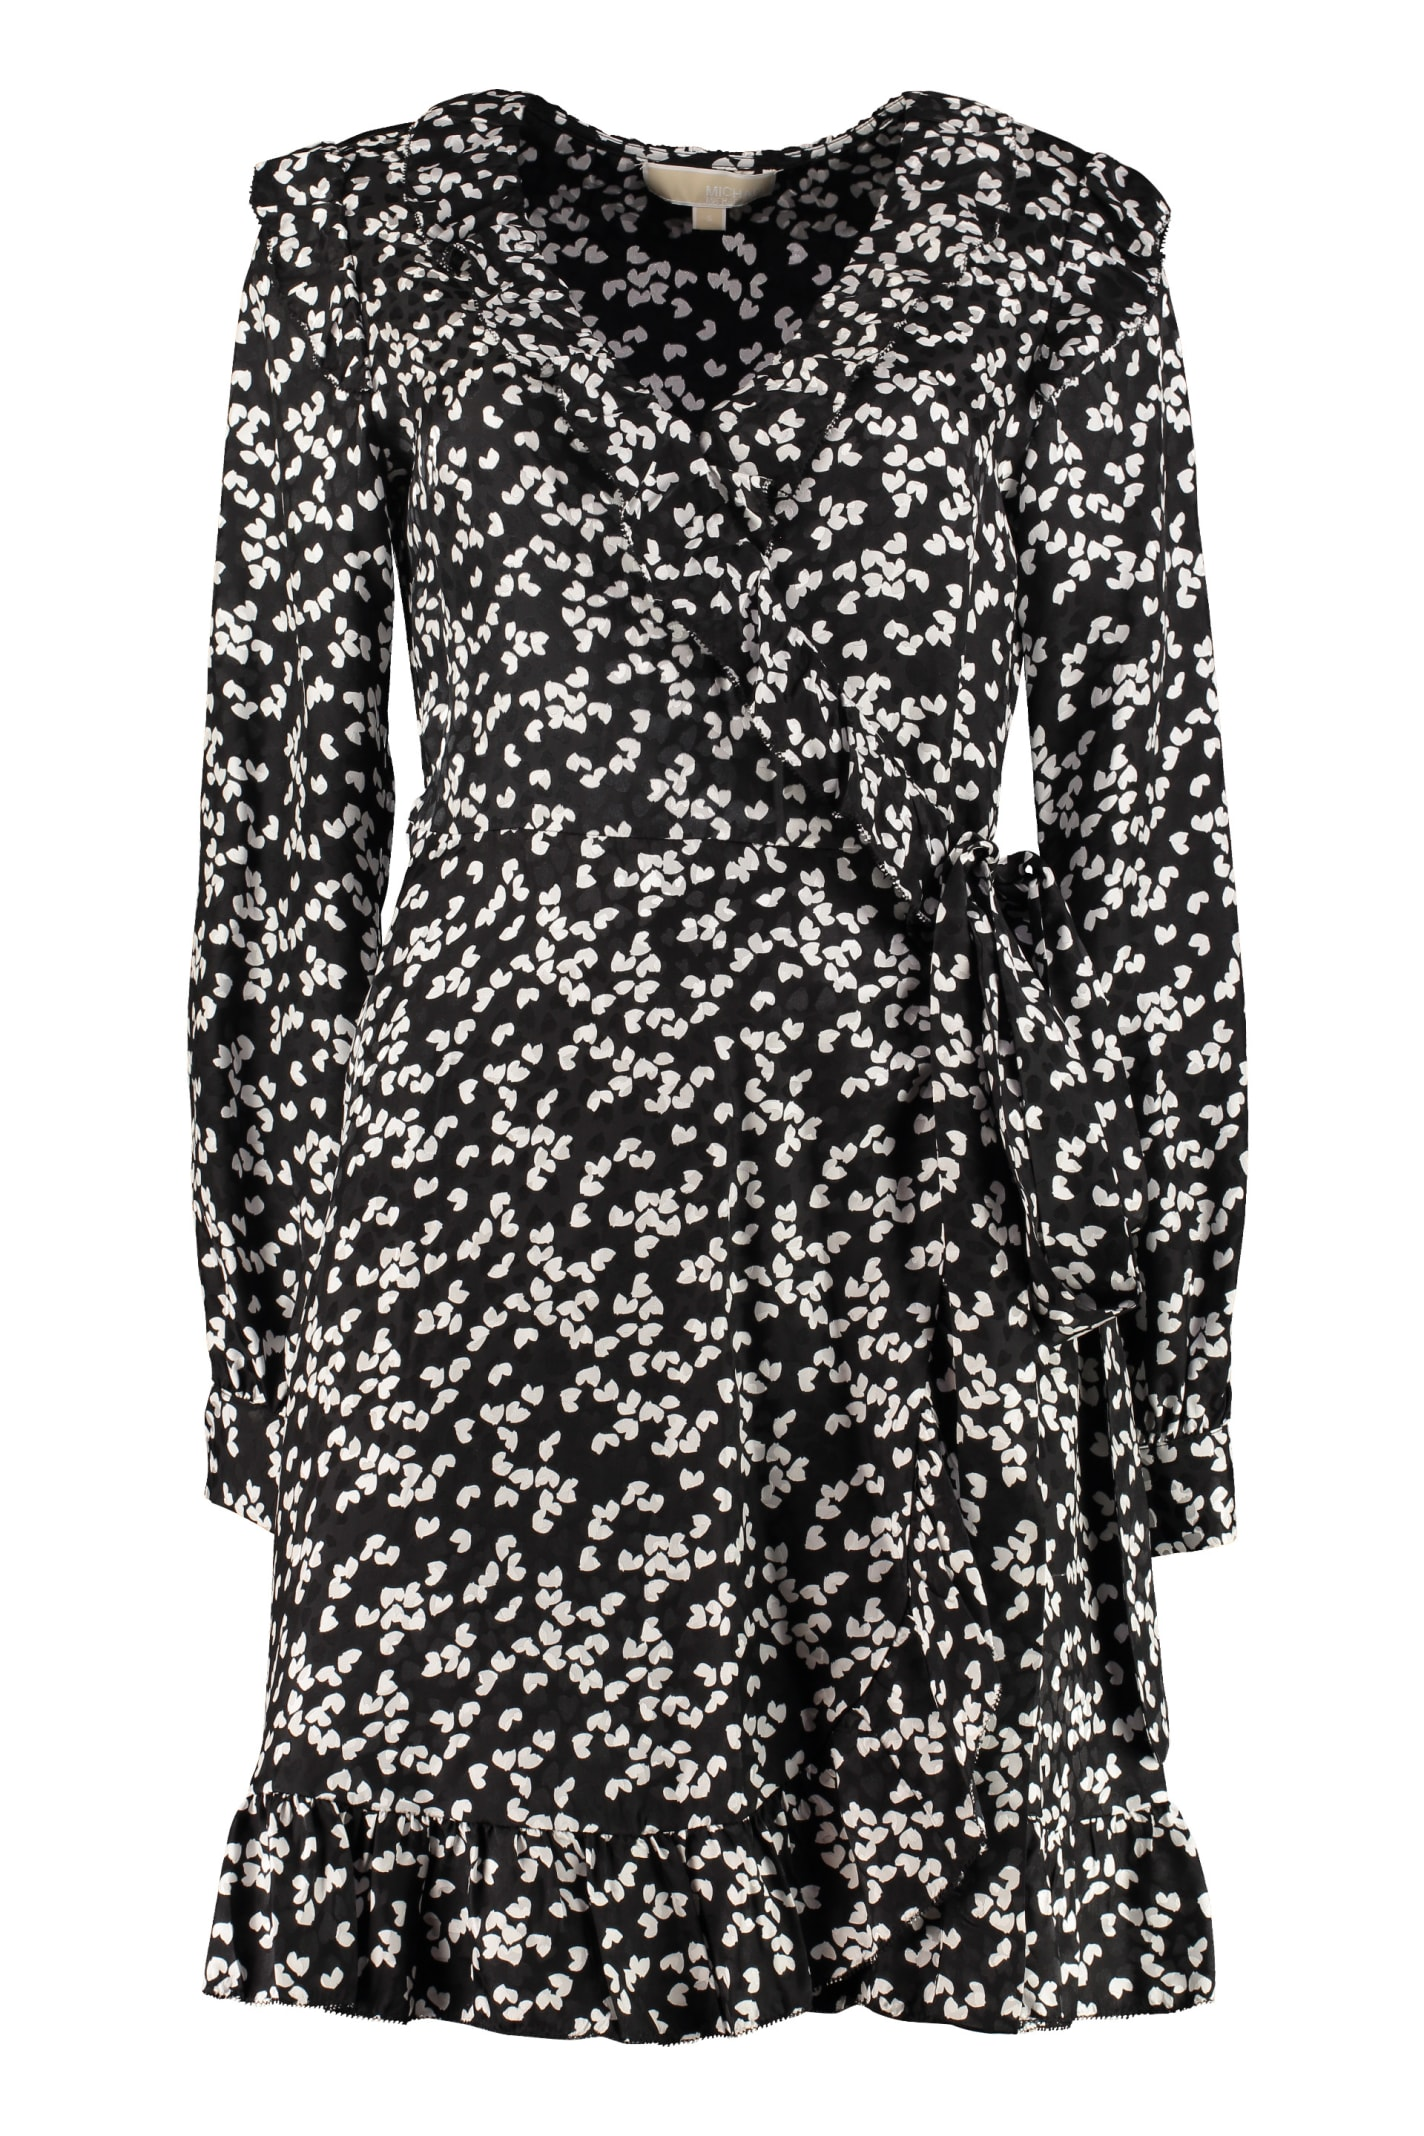 Buy MICHAEL Michael Kors Wrap-dress online, shop MICHAEL Michael Kors with free shipping